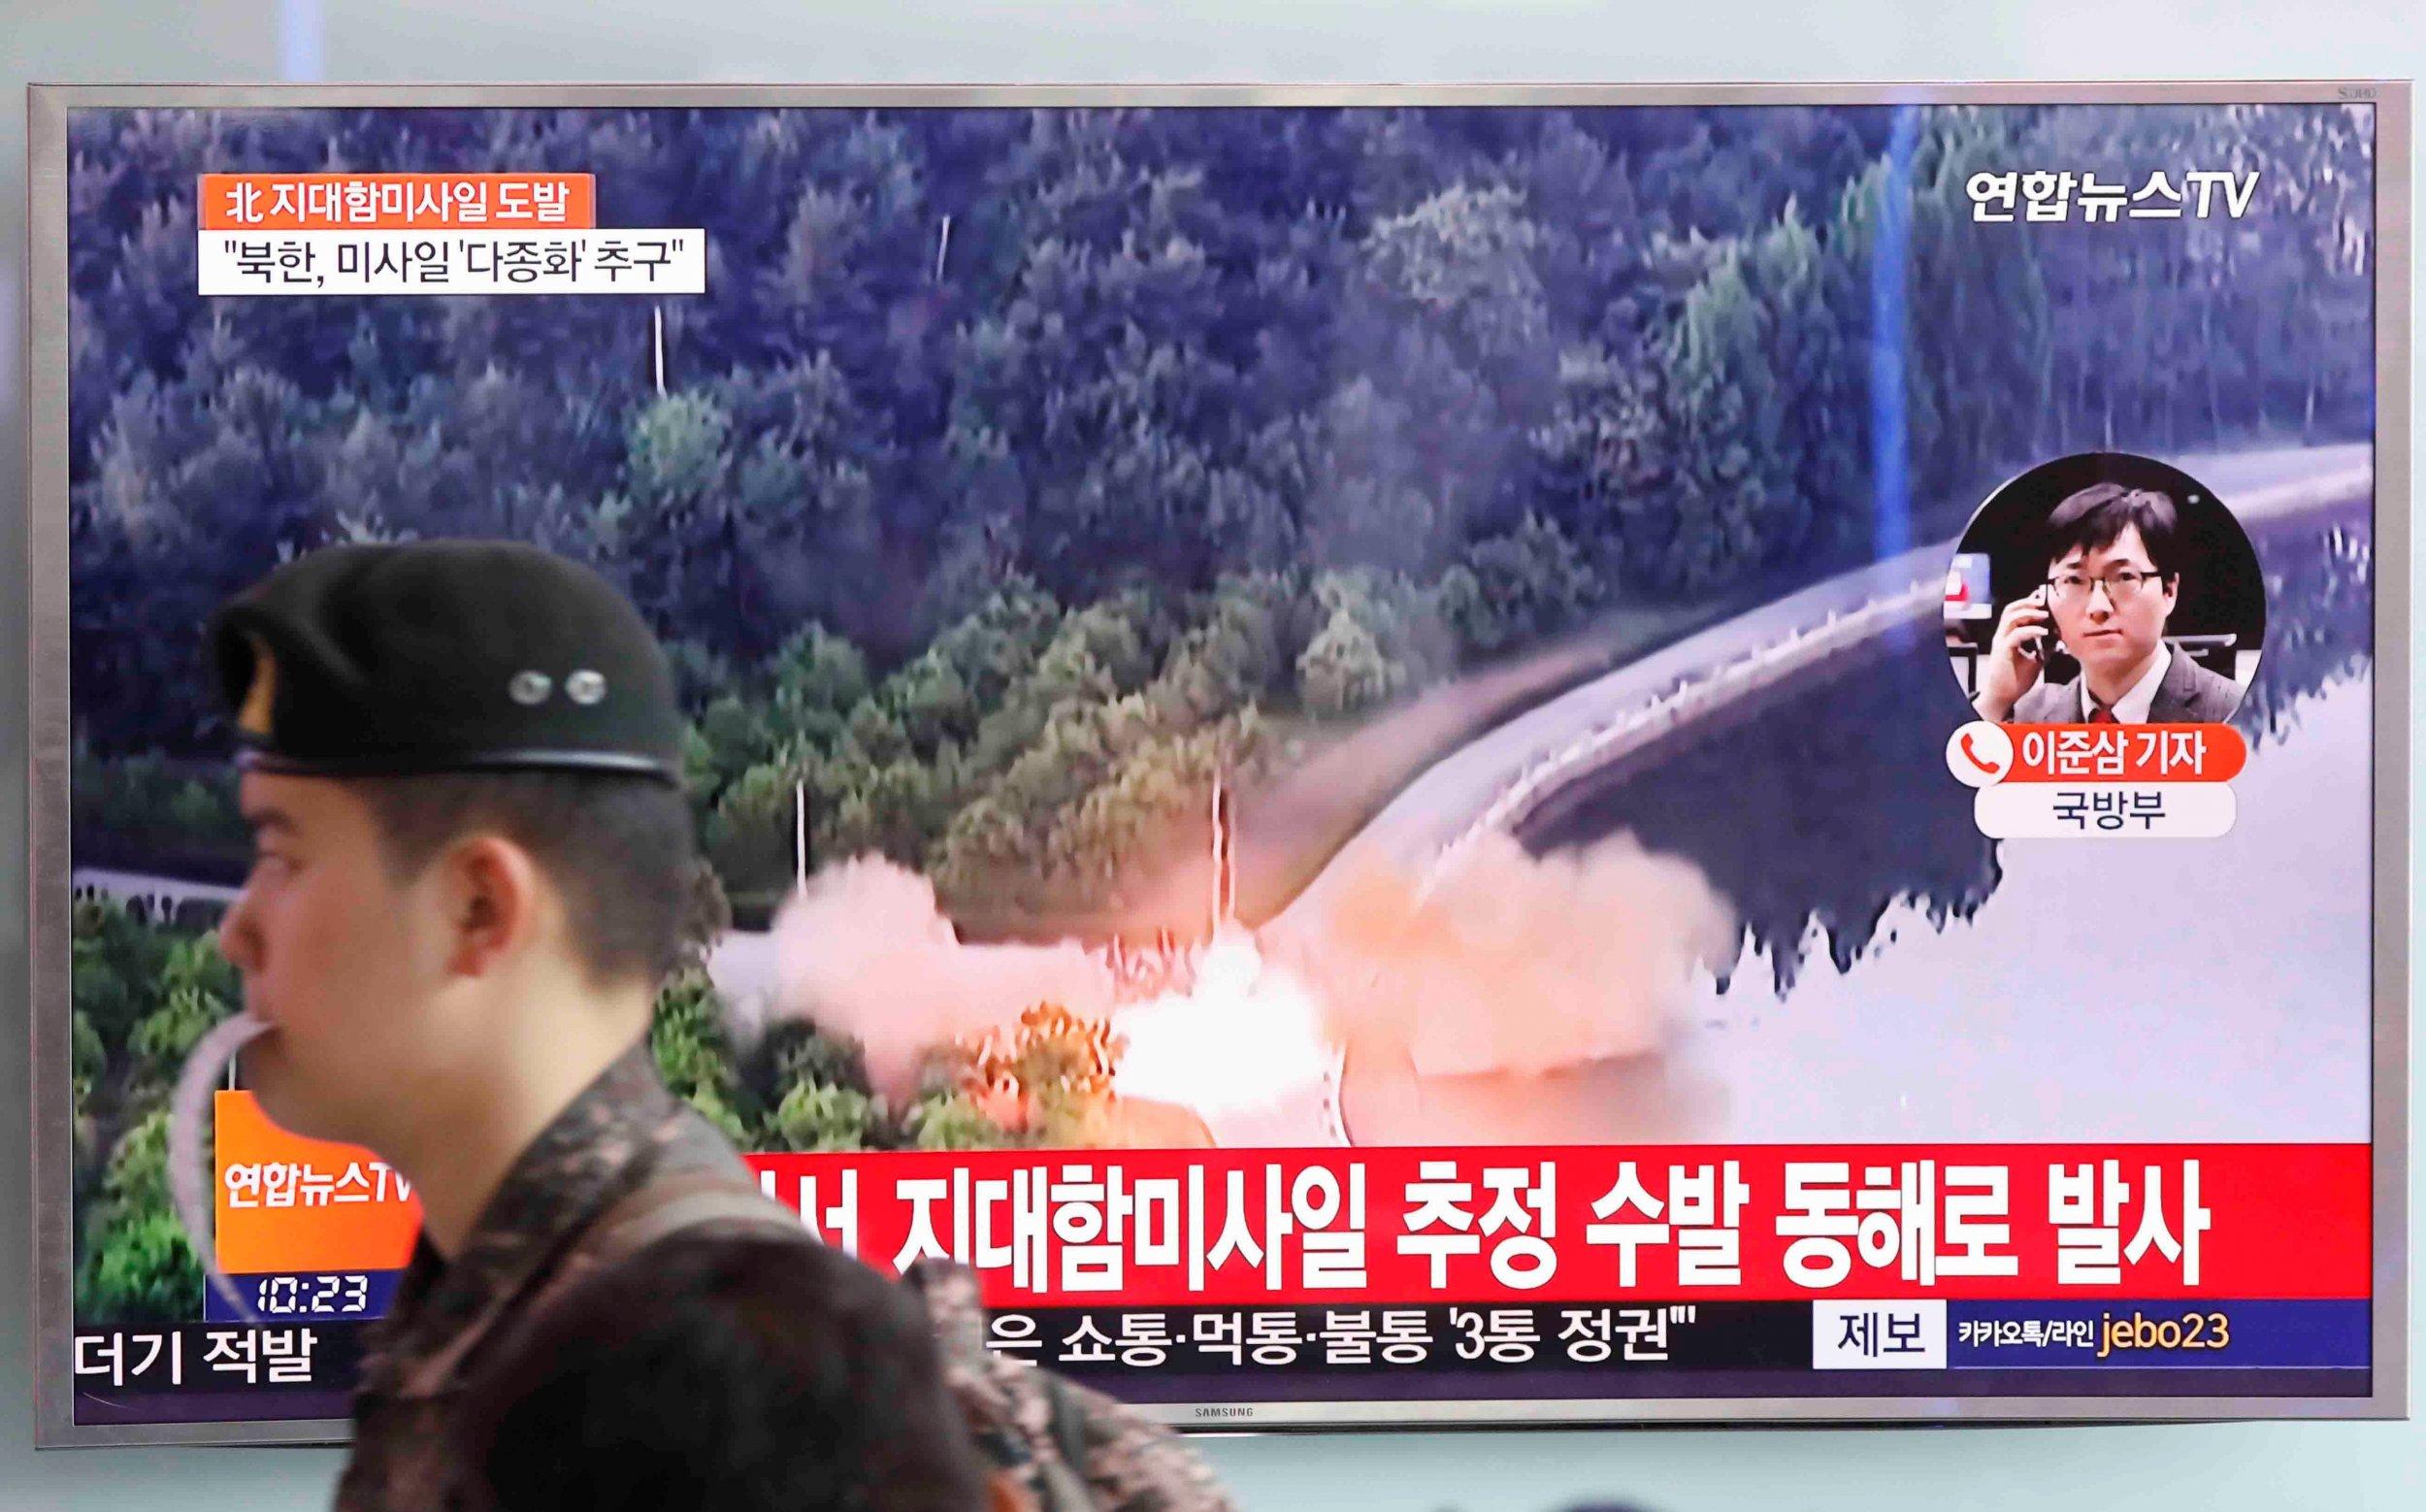 Missile NK